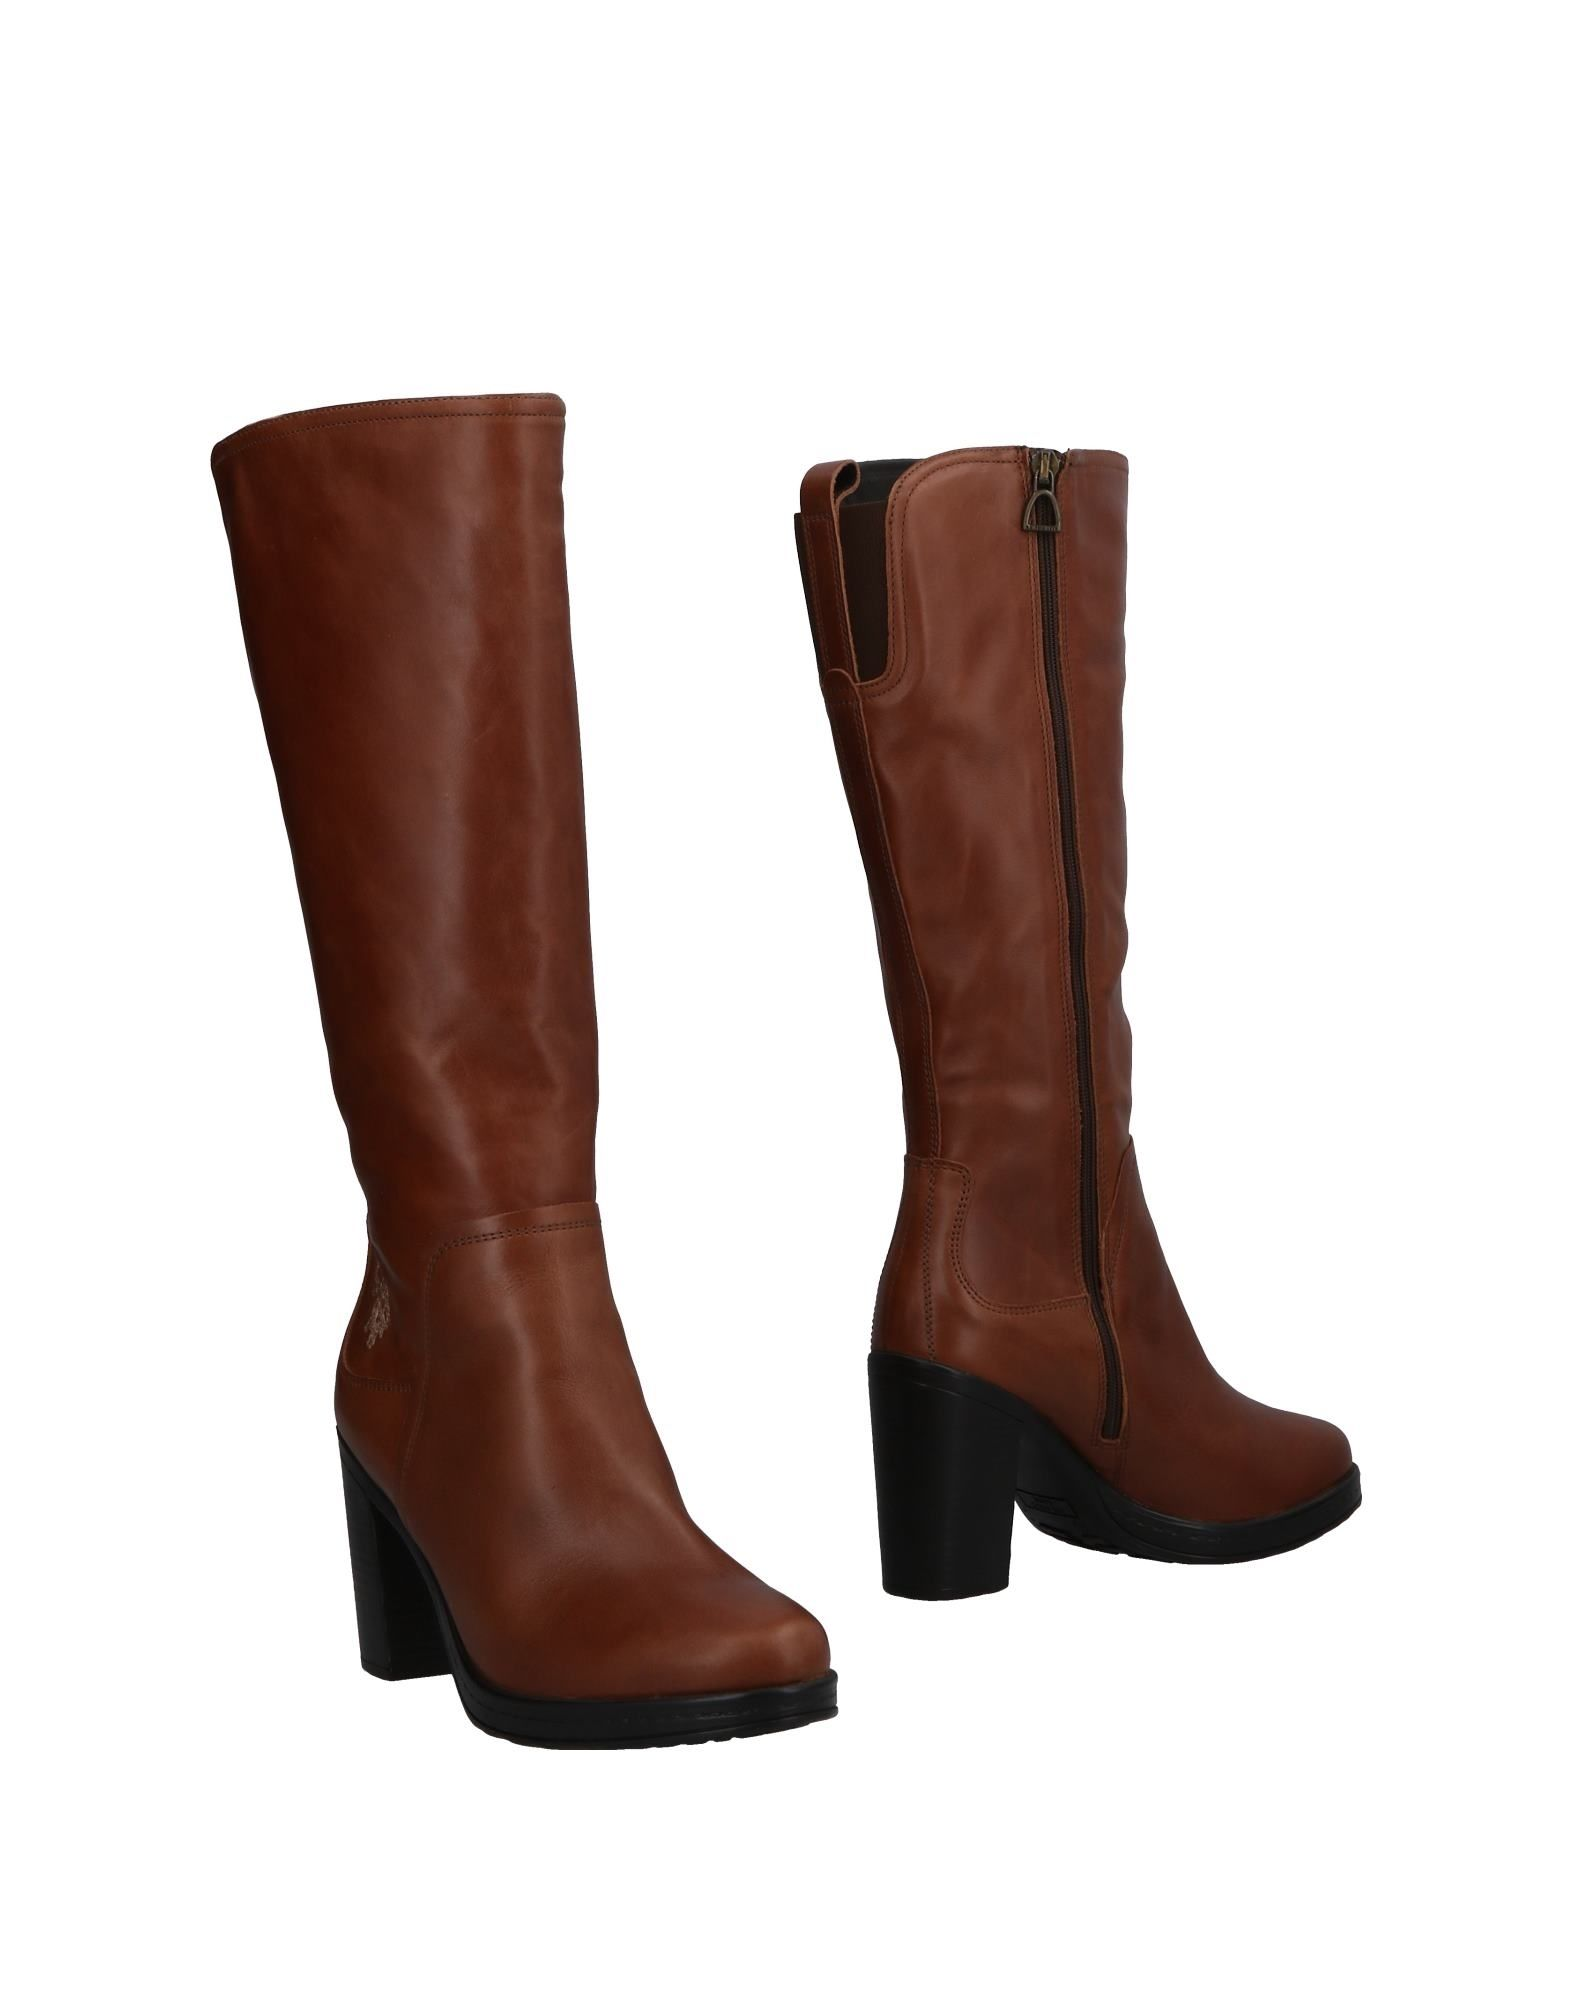 U.S.Polo Assn. Boots - Women U.S.Polo Assn. Boots Kingdom online on  United Kingdom Boots - 11499724QU 01d410